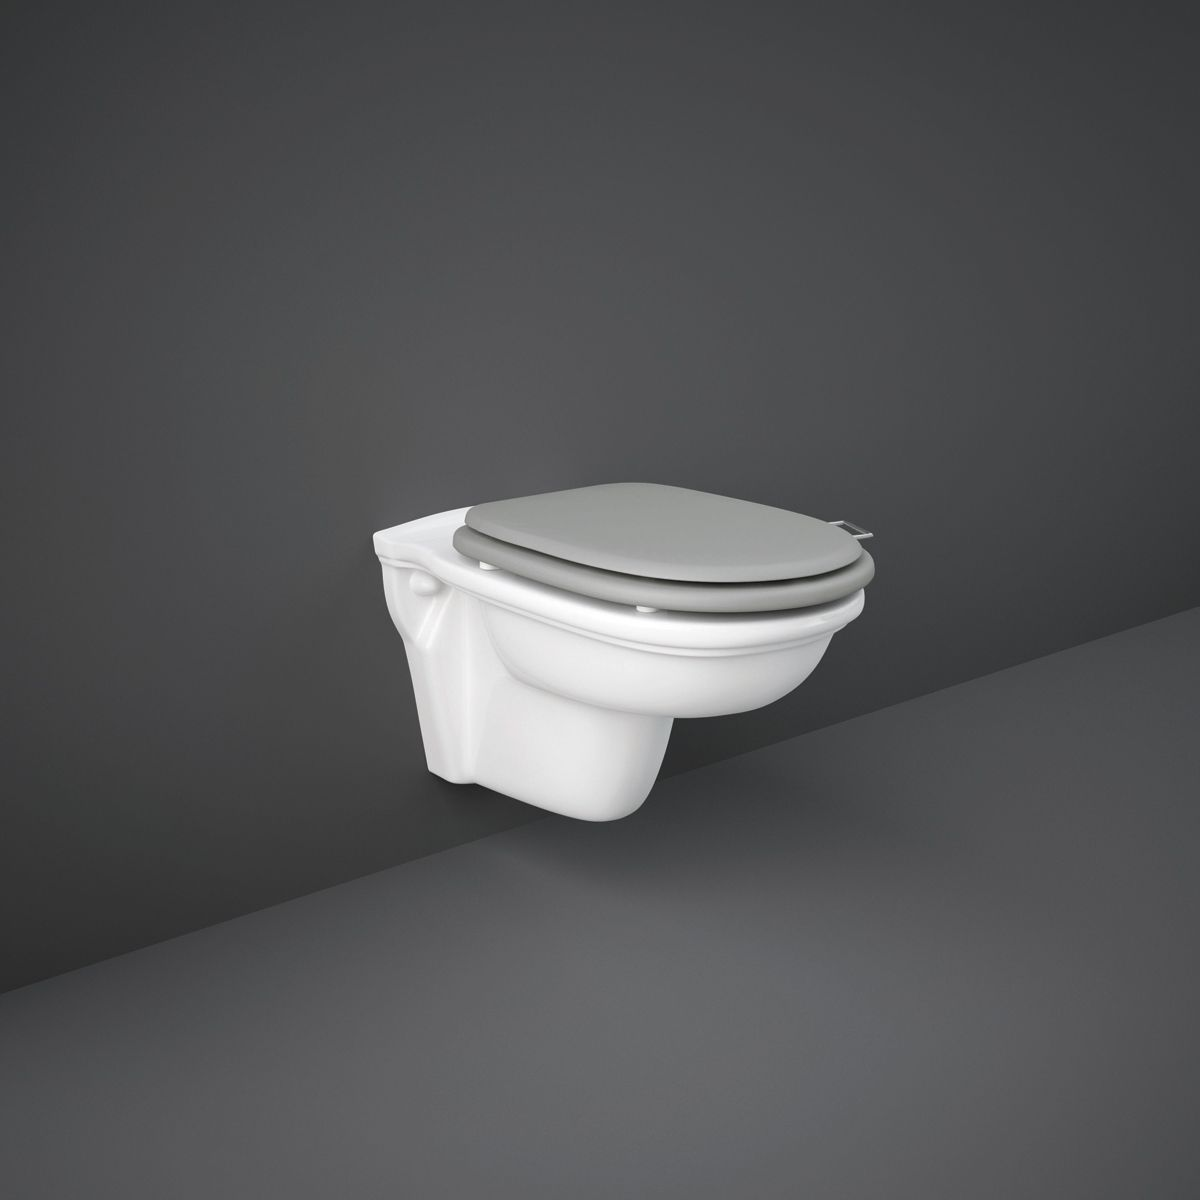 RAK Washington Wall Hung Toilet